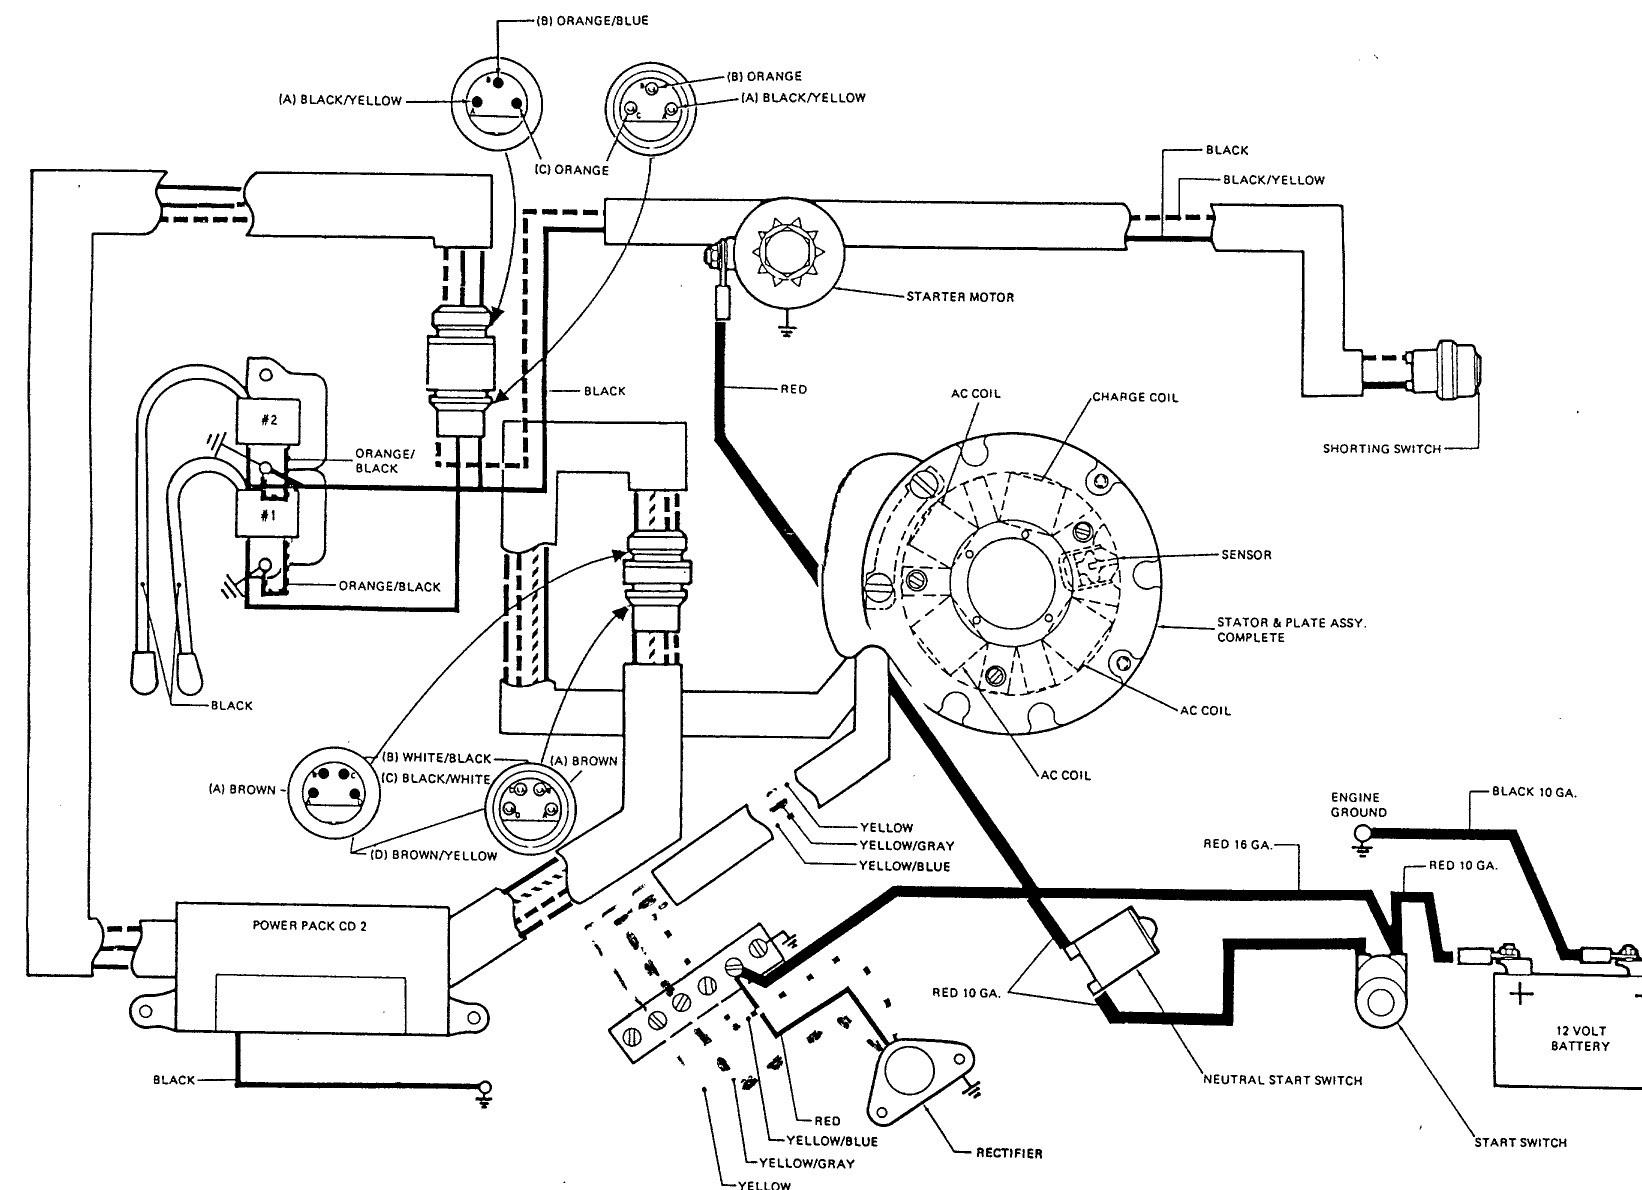 Marine engine diagram gas turbine engine parts win s online of marine engine diagram gas turbine